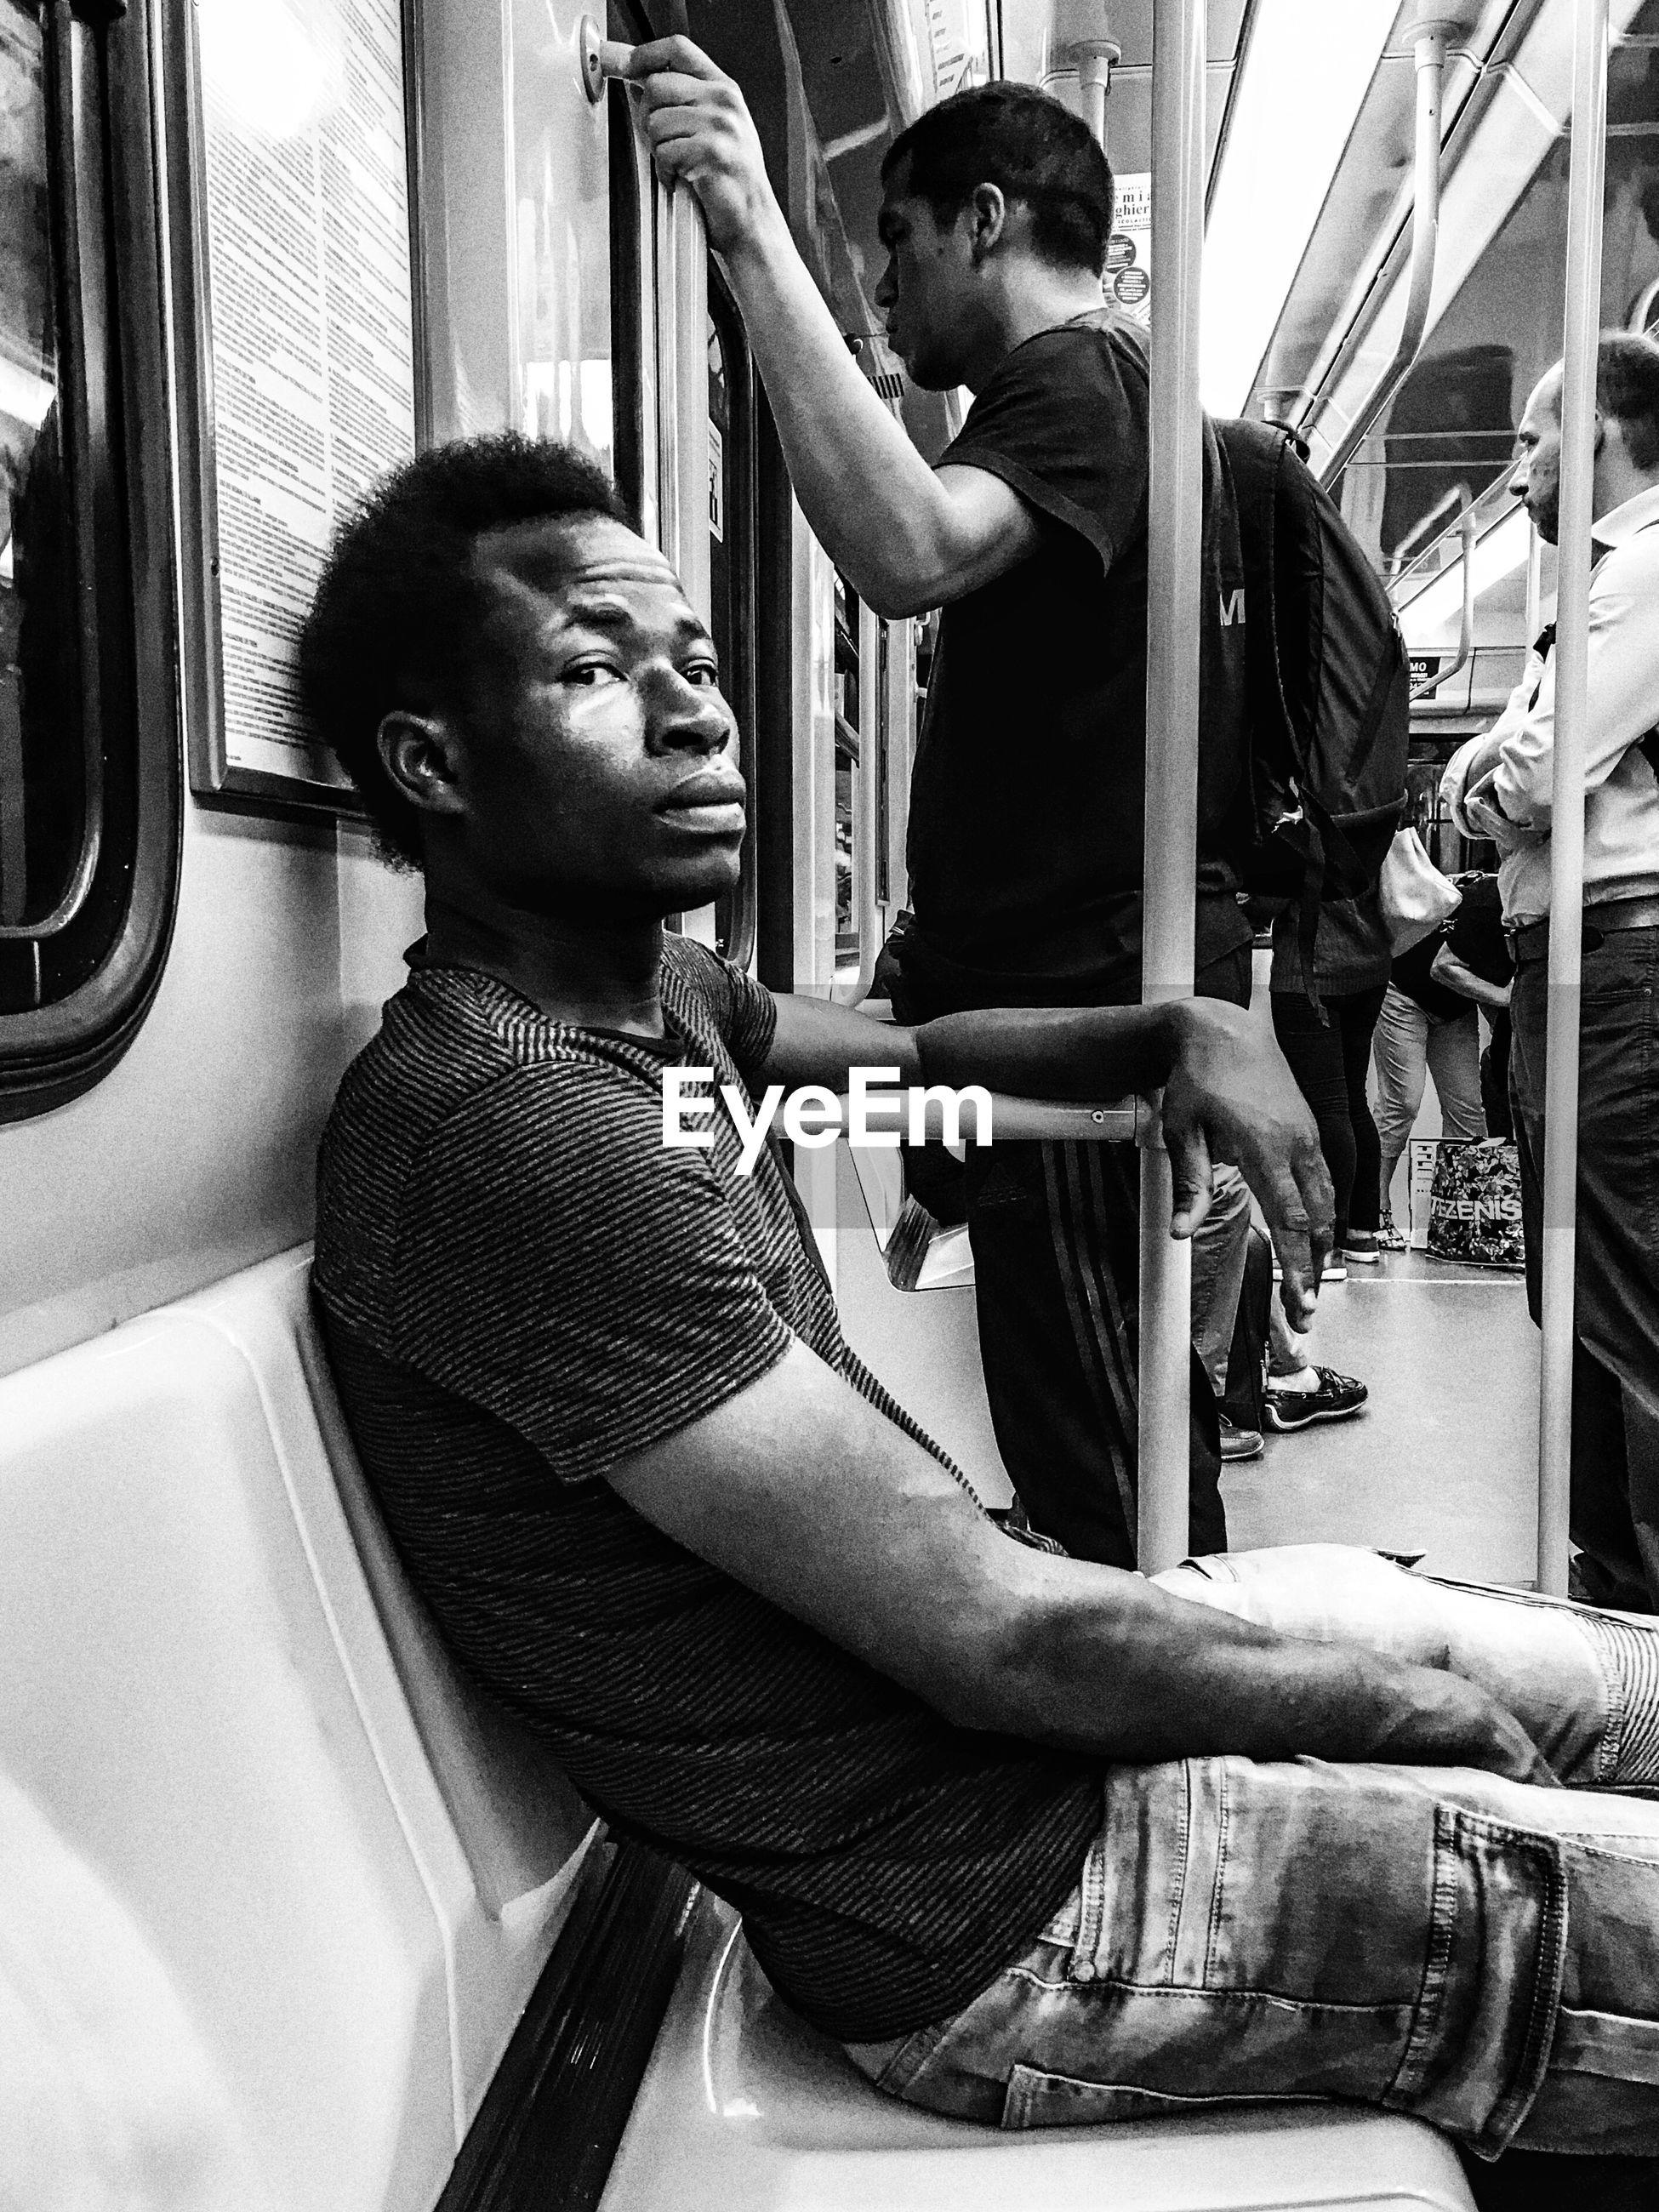 MAN SITTING ON TRAIN WINDOW